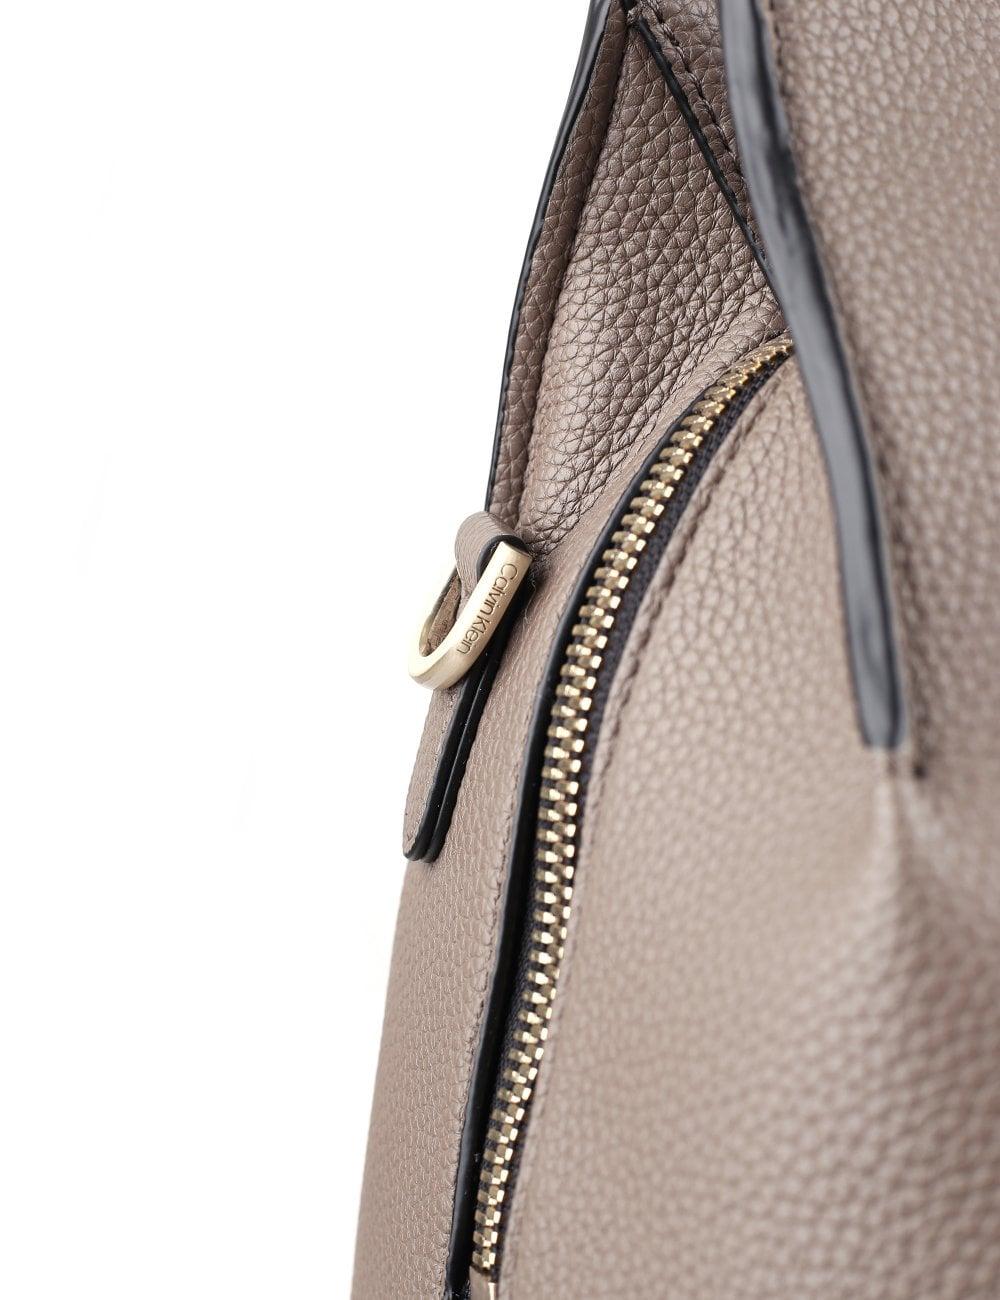 784e6fcfec7 ... Calvin Klein Women s Neat Large Tote Bag. Tap image to zoom.  Women  039 s Neat Large ...